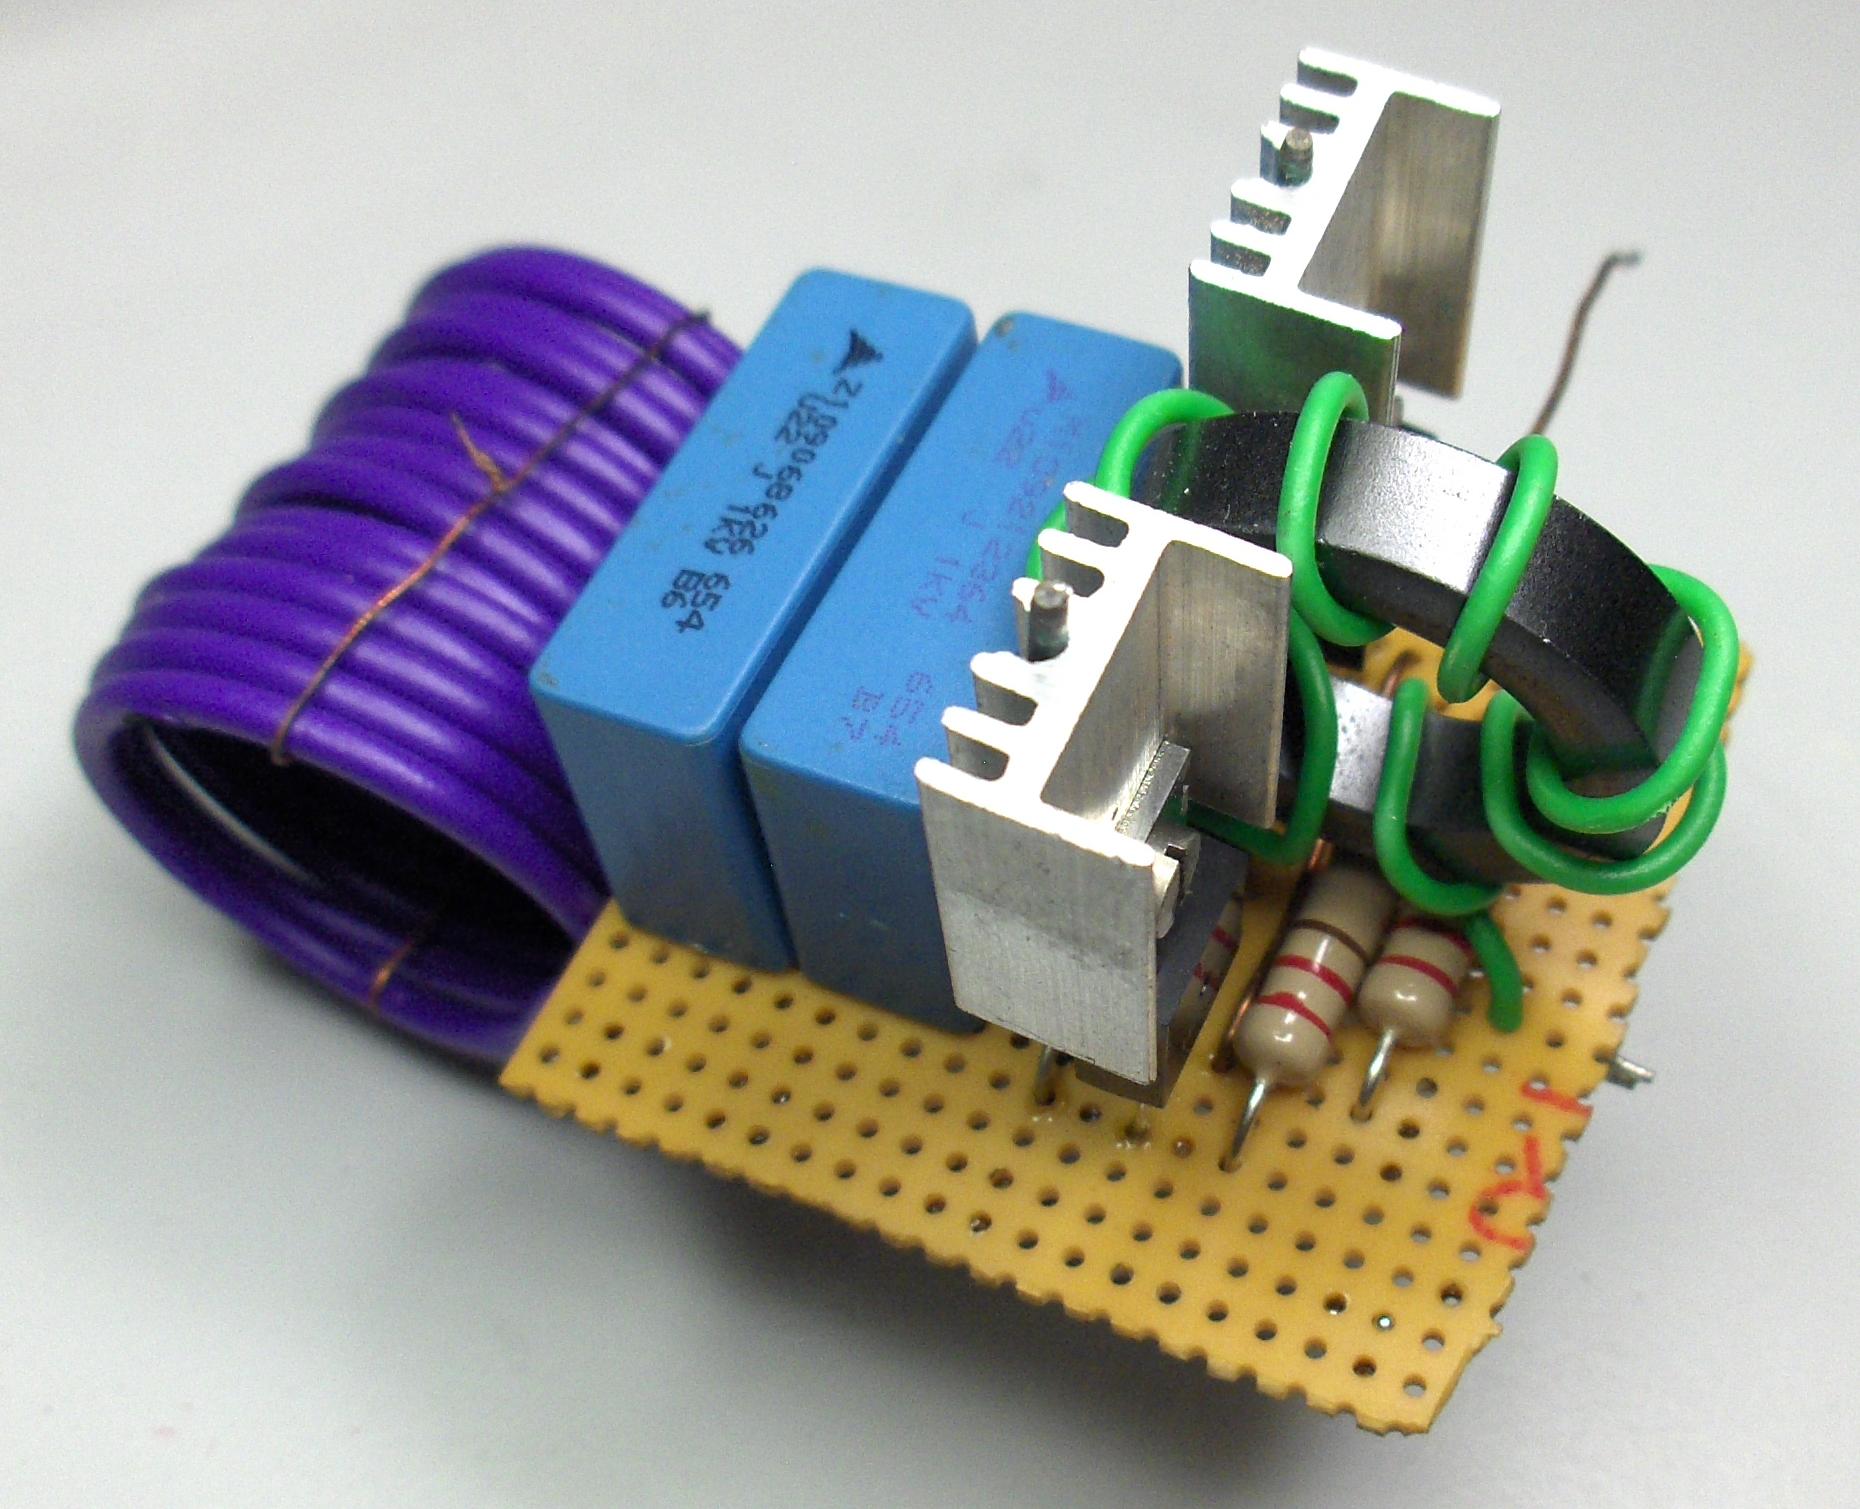 induction heater induction forge induction heating dc circuit circuit diagram home electronics [ 1860 x 1509 Pixel ]